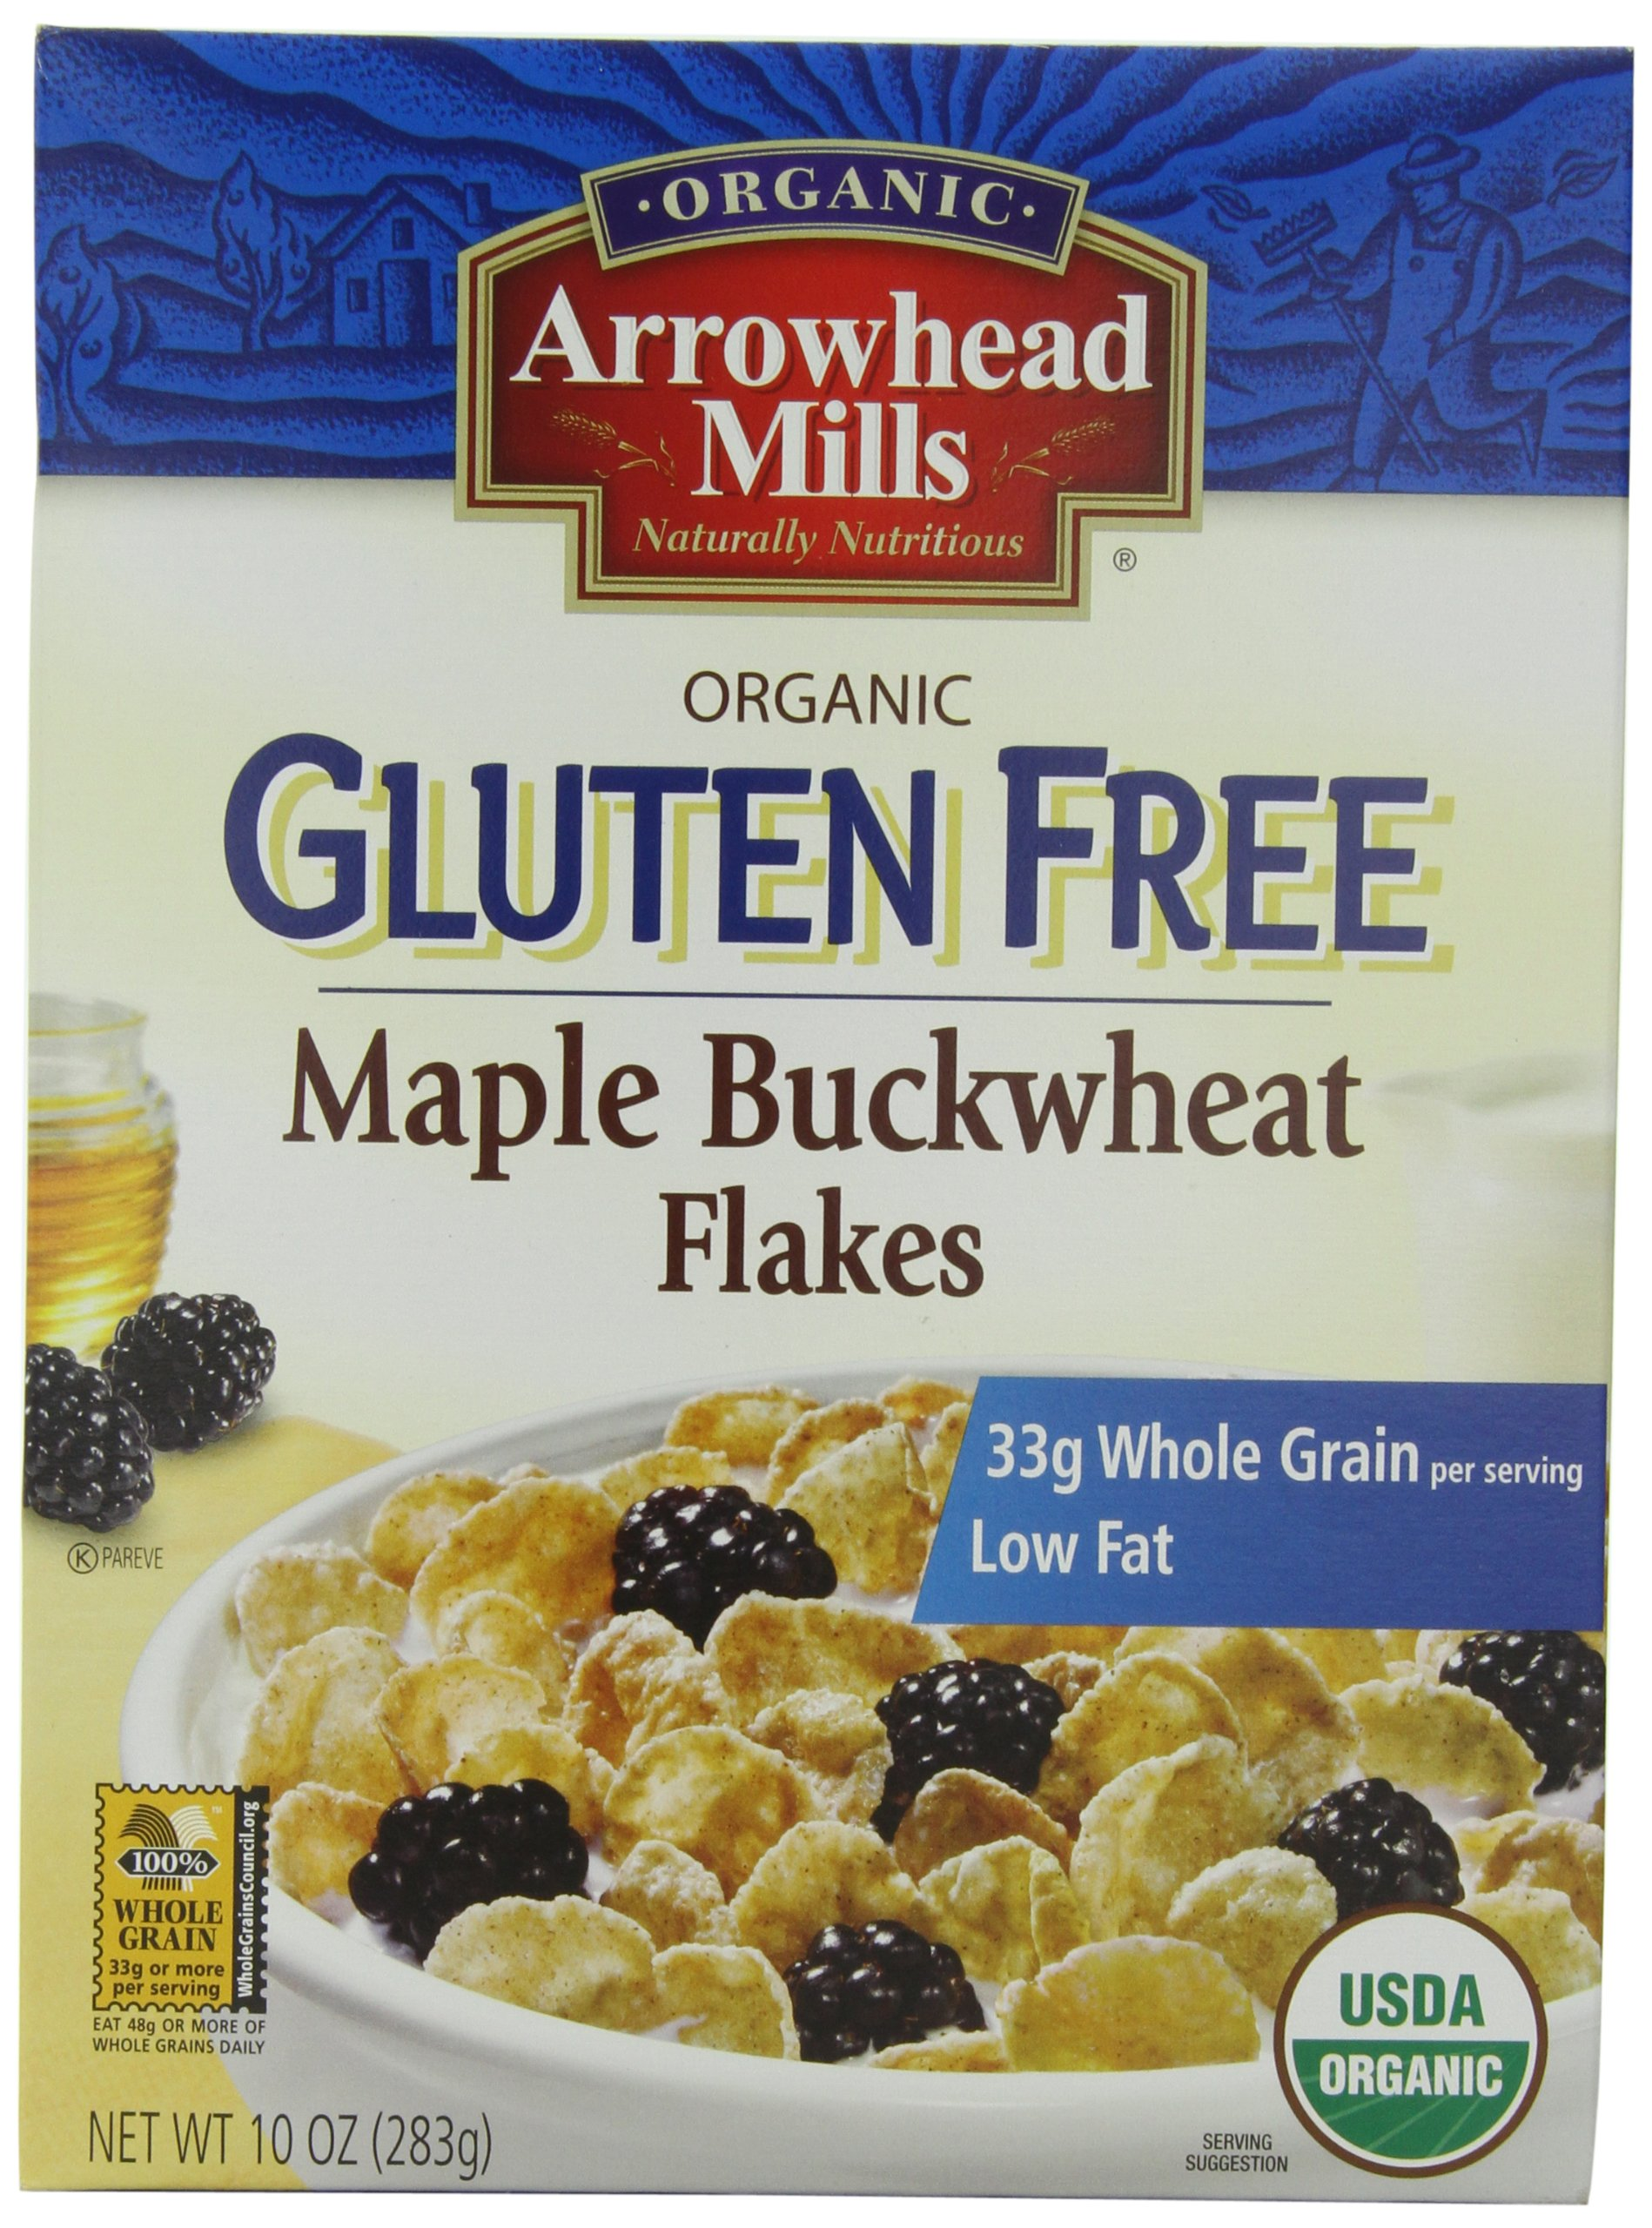 Arrowhead Mills Gluten Free Cereal, Organic Maple Buckwheat Flakes, 10 Ounce (Pack of 12) by Arrowhead Mills